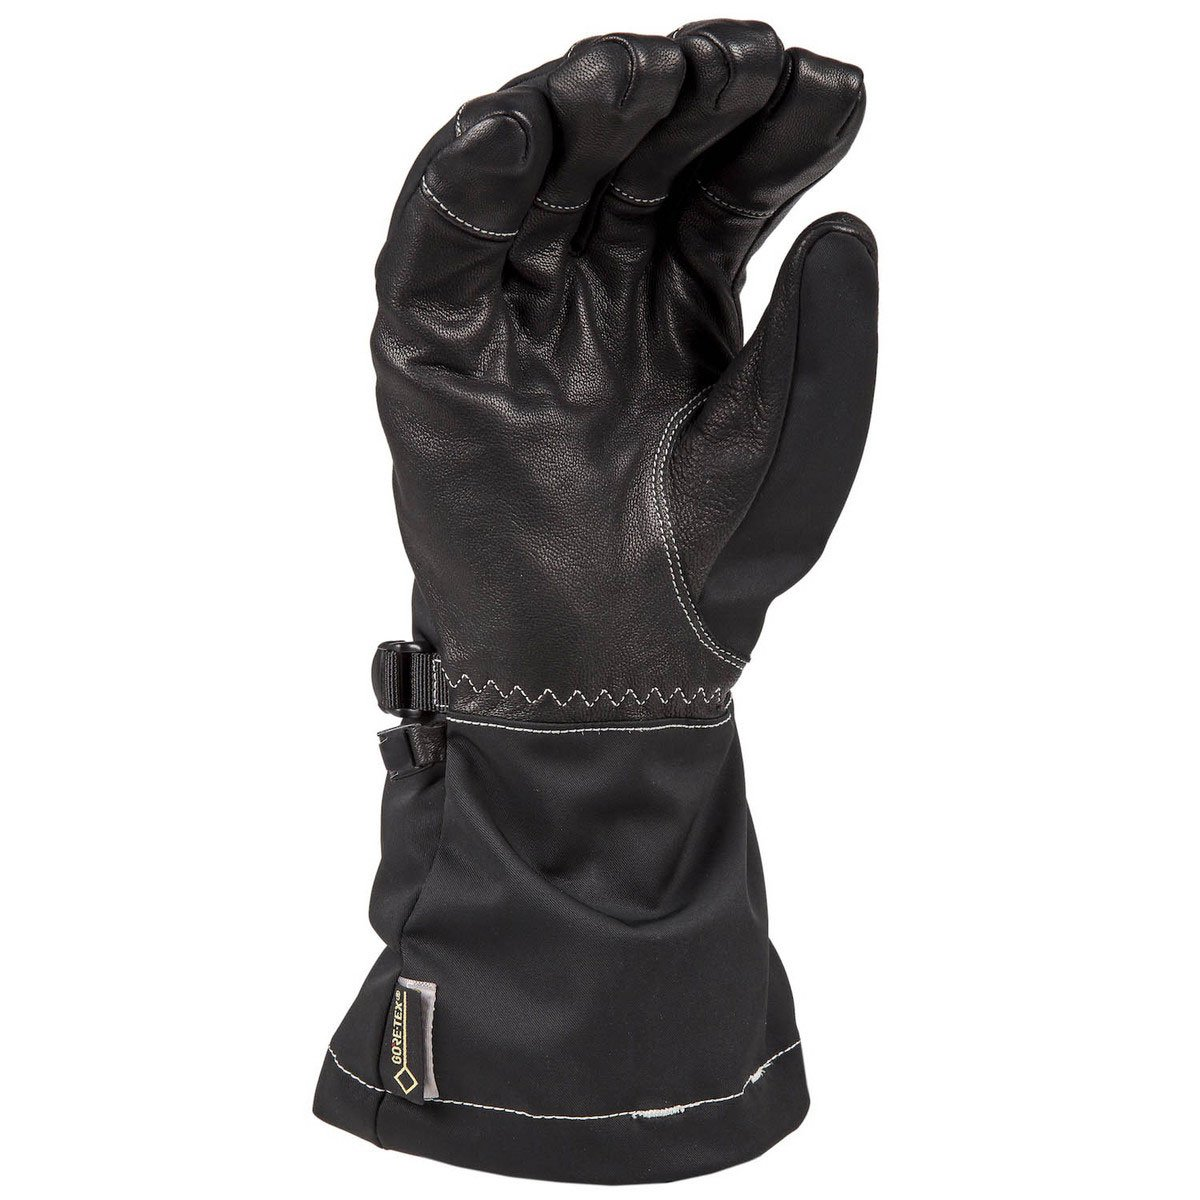 Klim Allure Women's Ski Snowmobile Gloves - Matte Black / Large by Klim (Image #2)